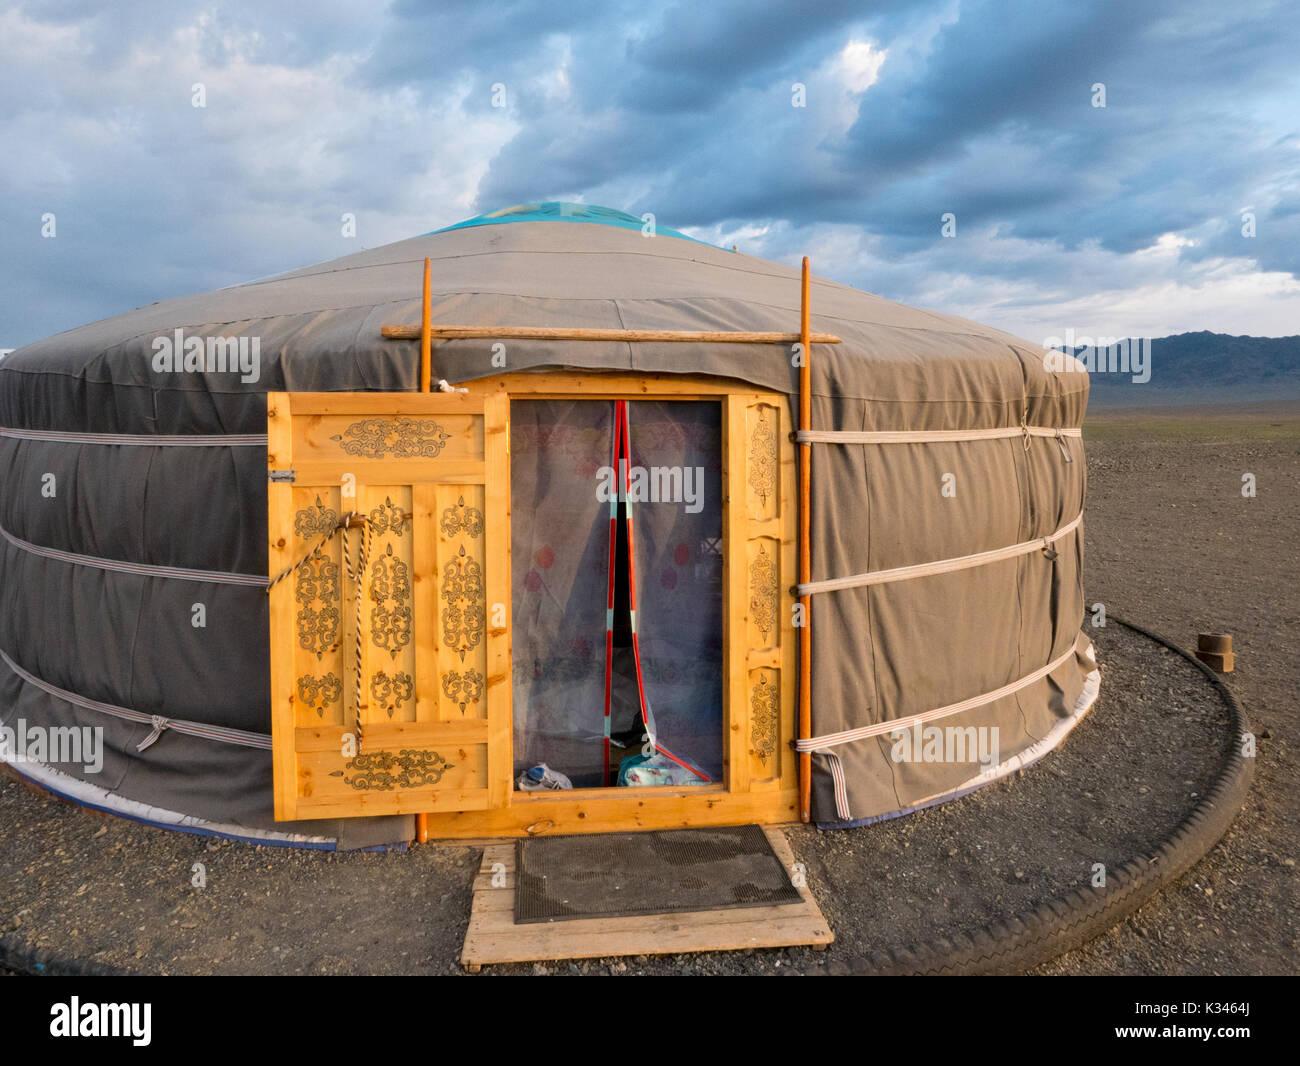 Mongolia Yurt nel Deserto del Gobi Immagini Stock